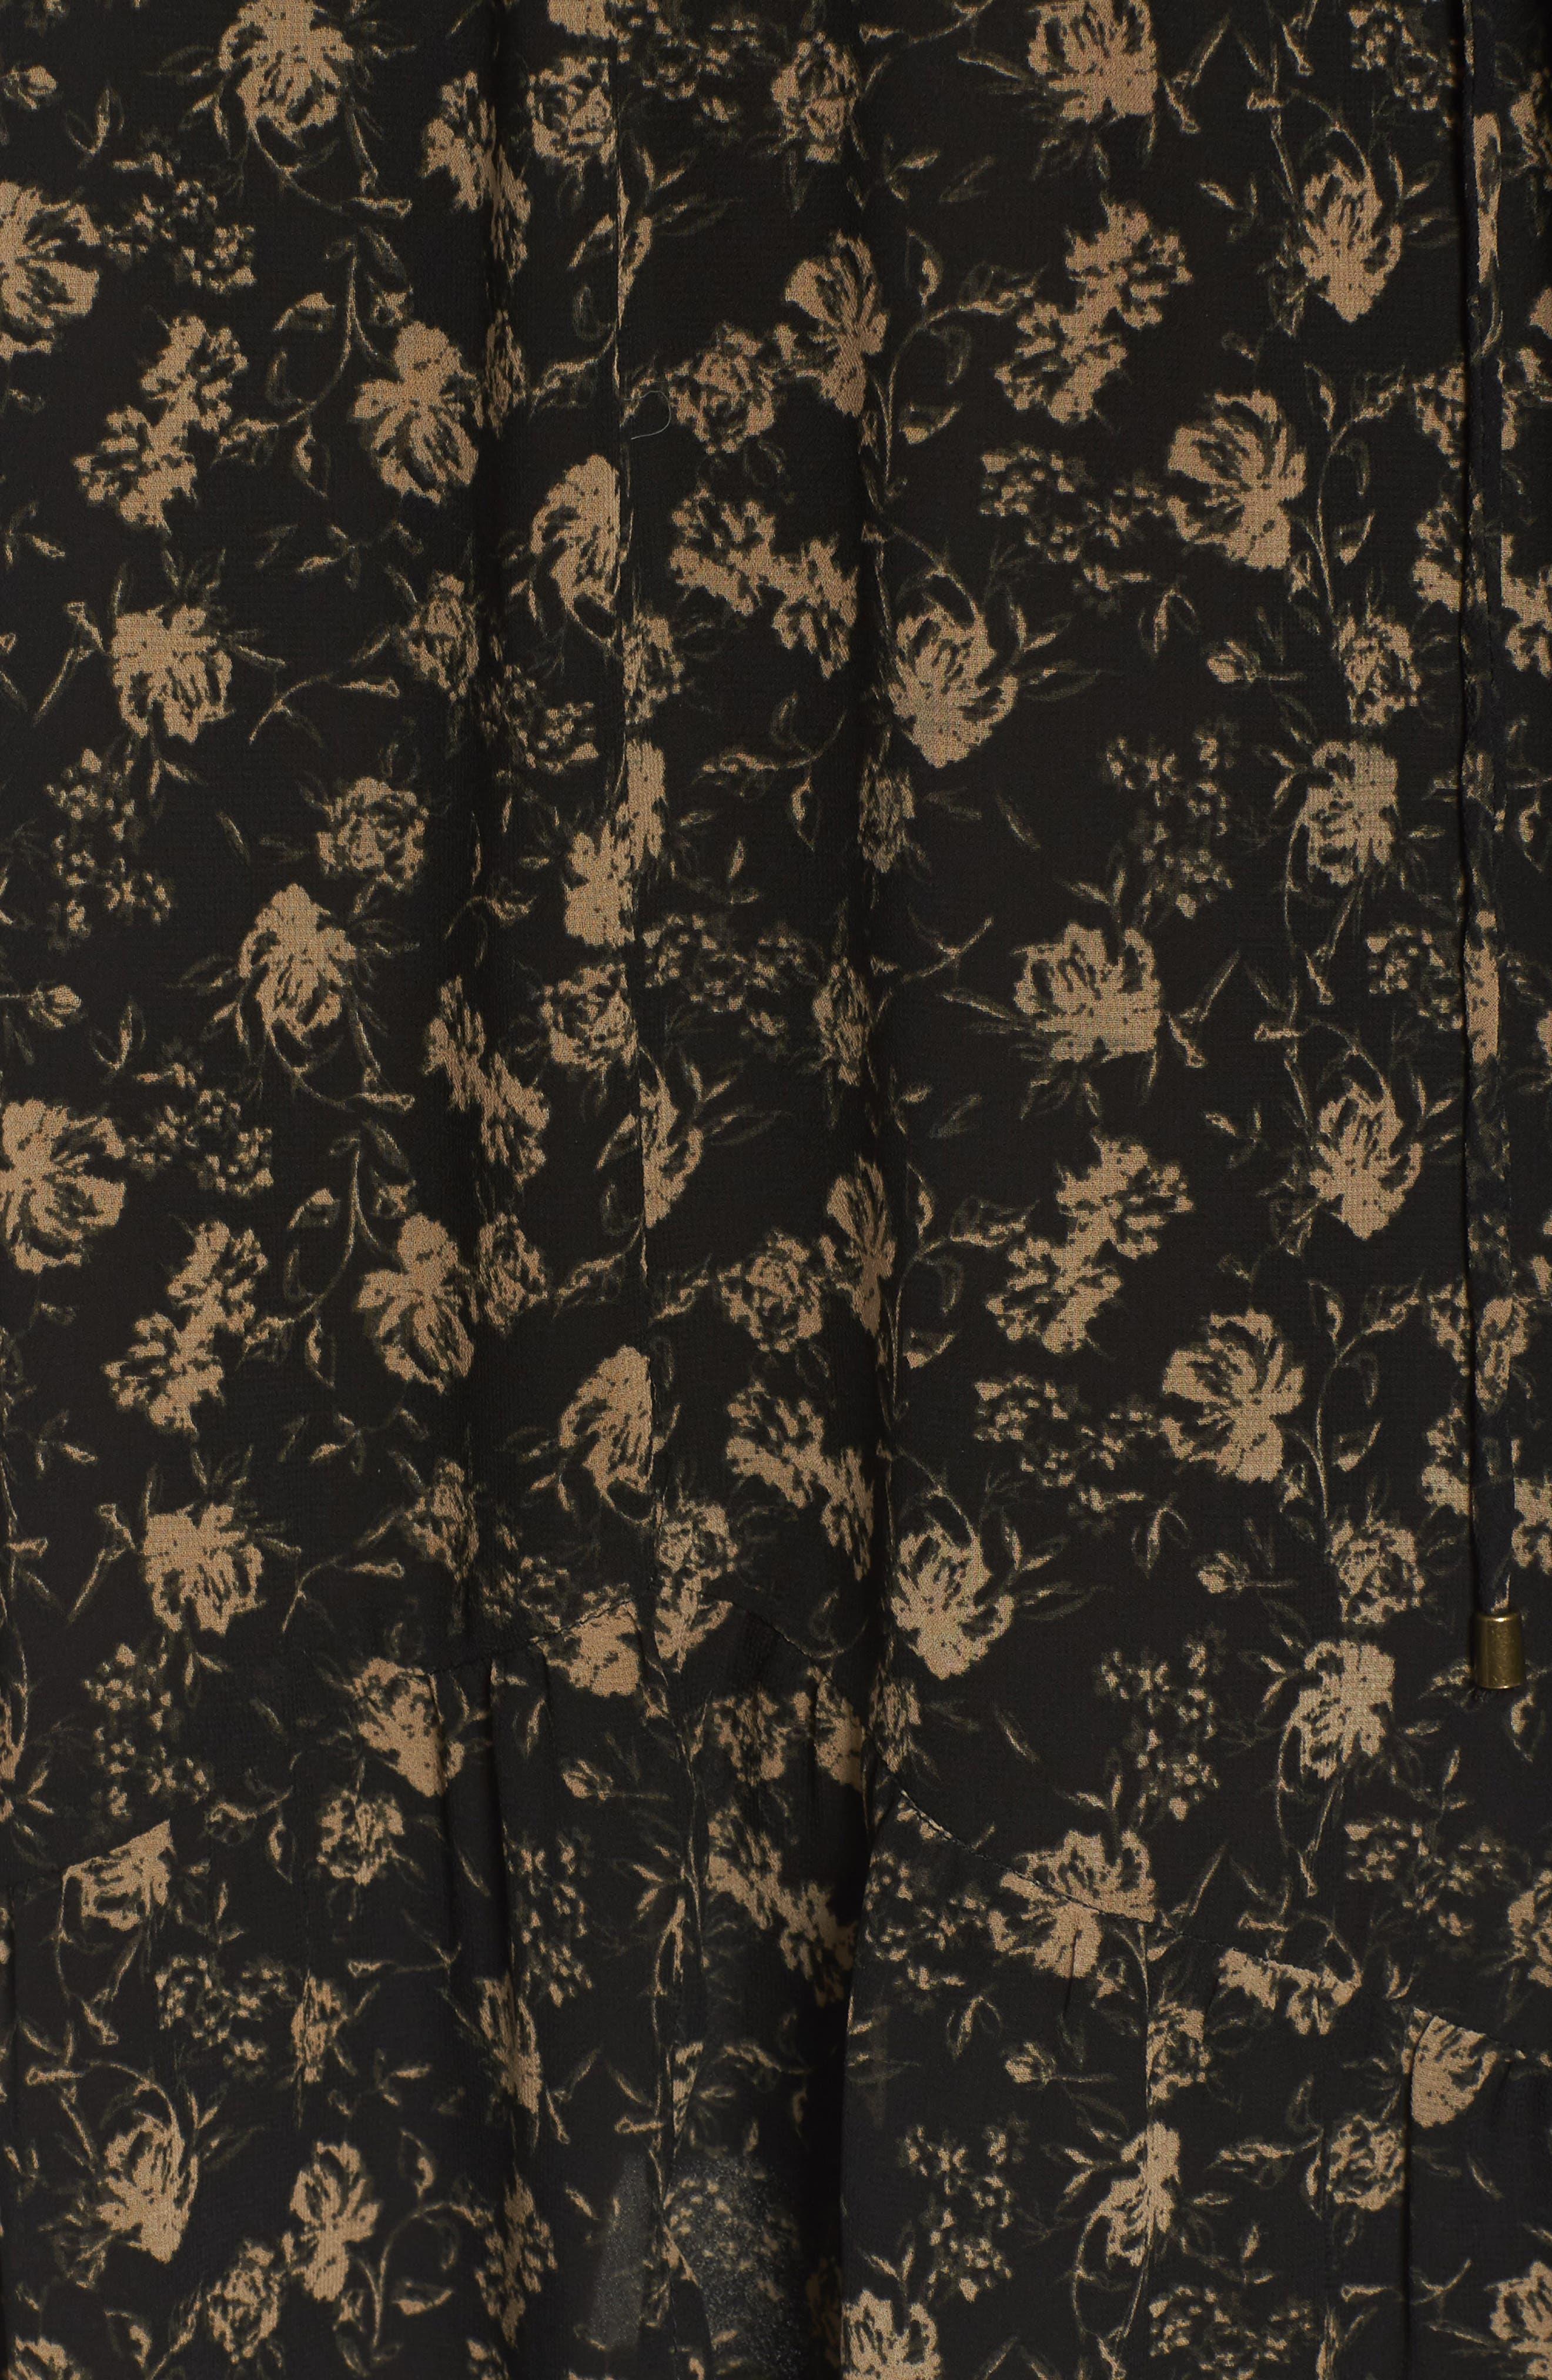 Ambrosia Shift Dress,                             Alternate thumbnail 5, color,                             001